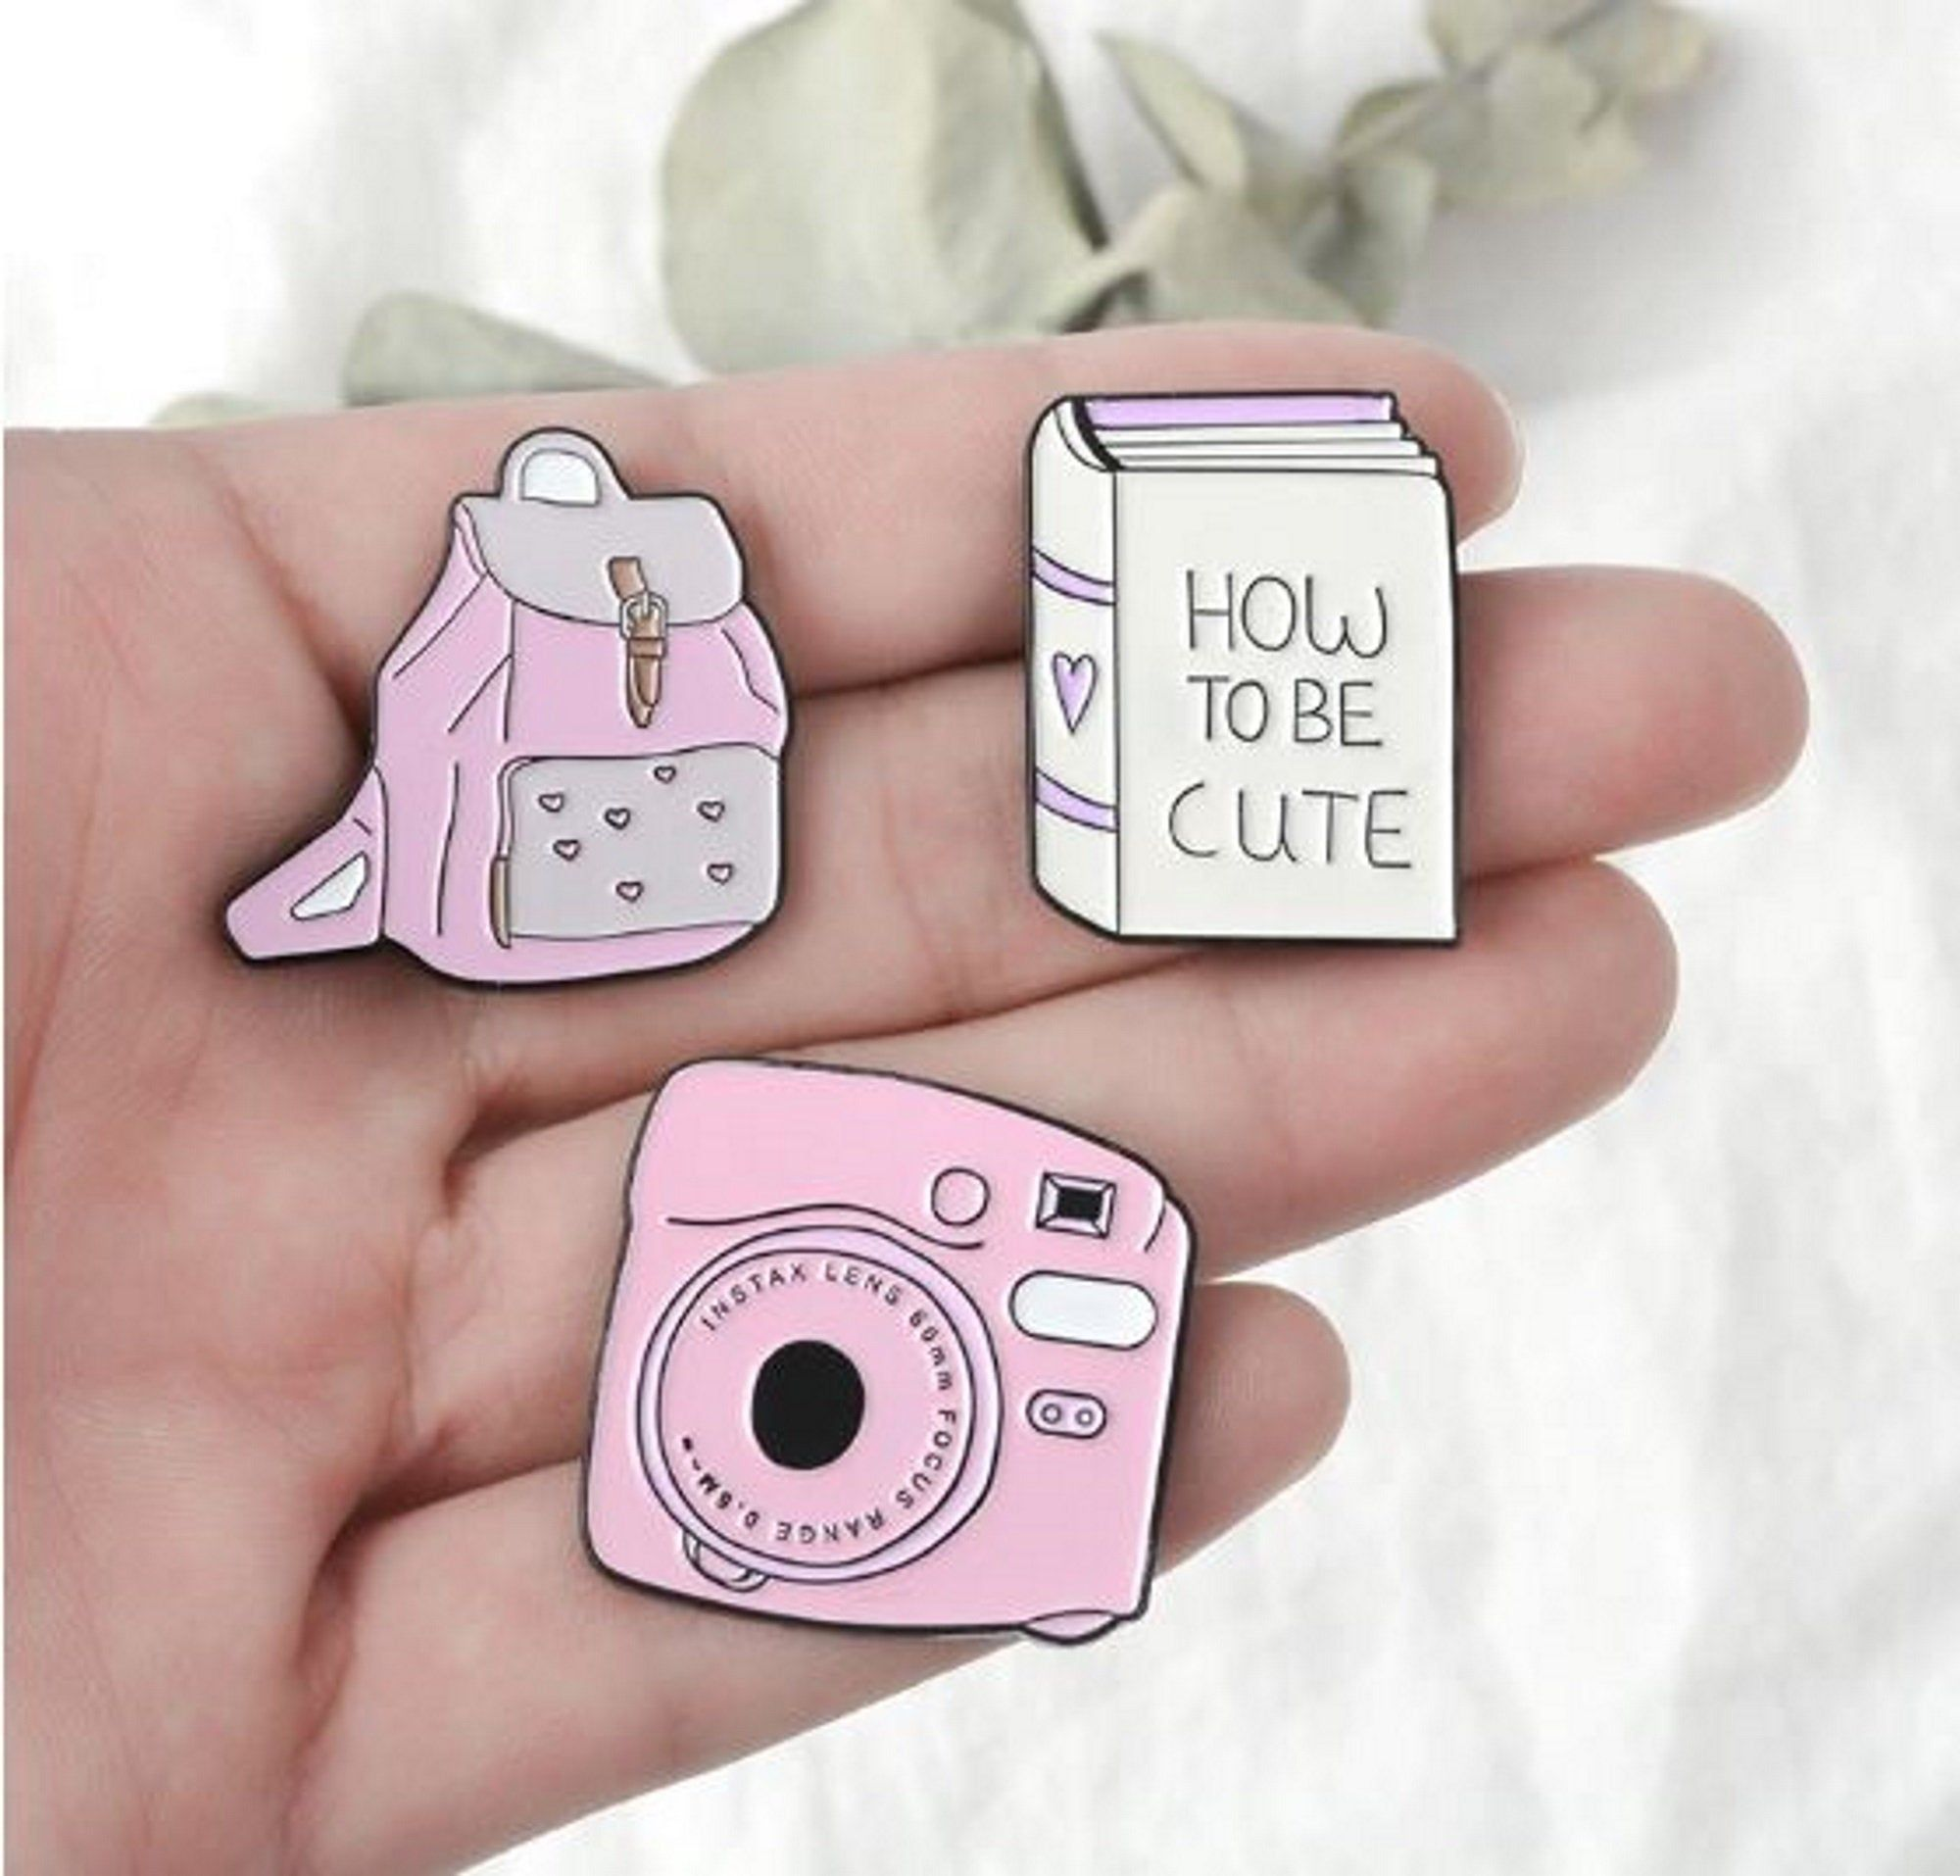 Girly Backpack Book Camera Enamel Pins Pink Brooches In 2020 Enamel Pins Pink Brooch Girly Backpacks